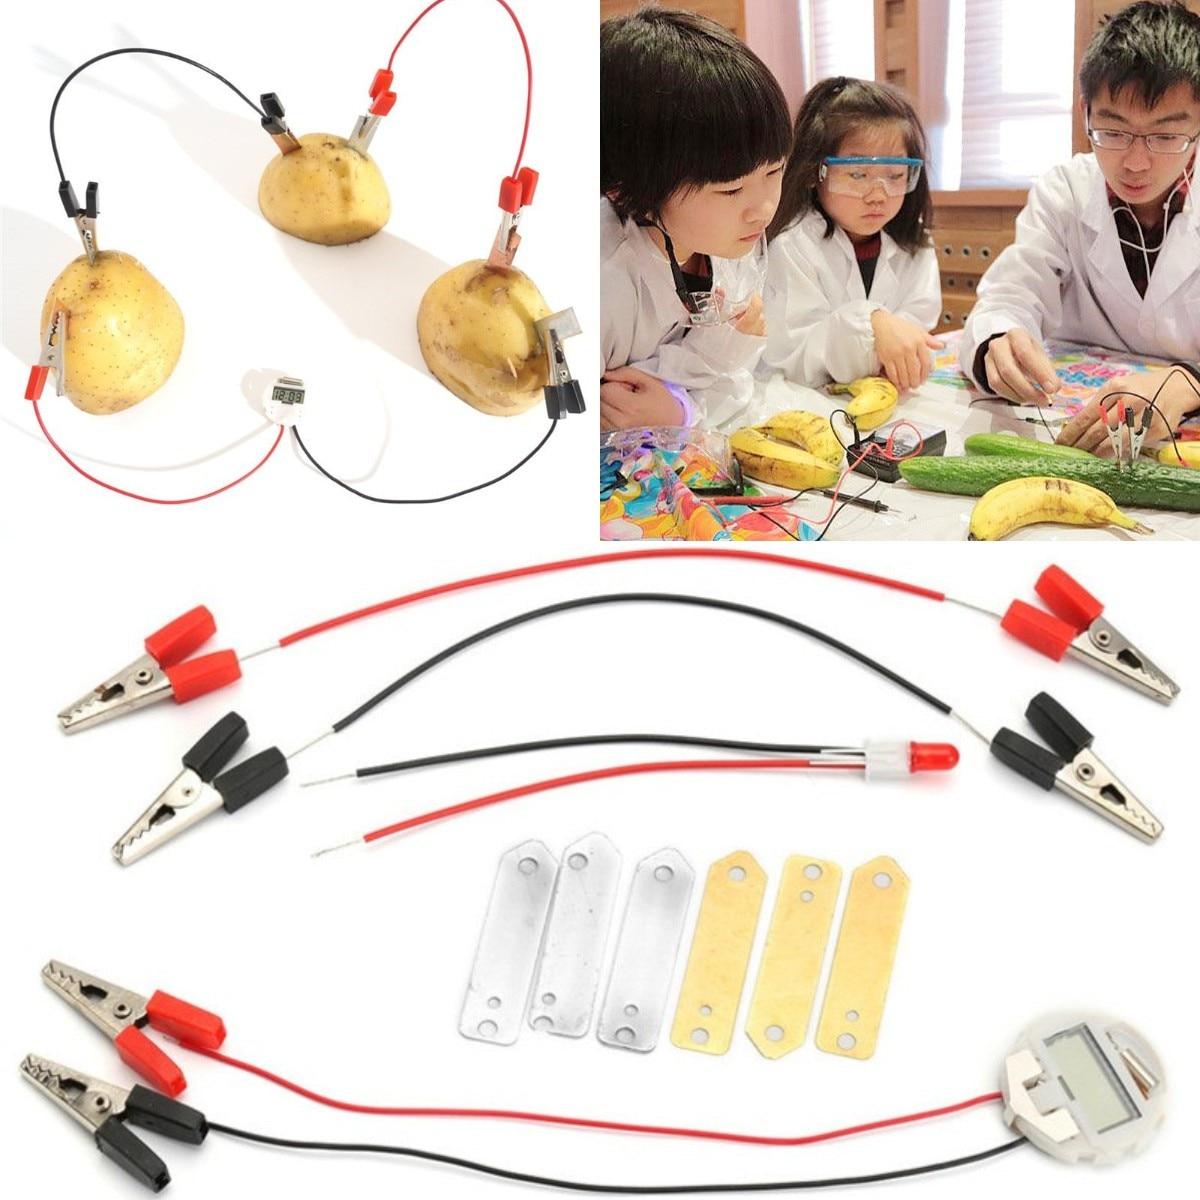 Potato Fruit Biologia Energy Generate Electricity Science Experiment Educational Toys For Children Kids School Electric STEM Kit